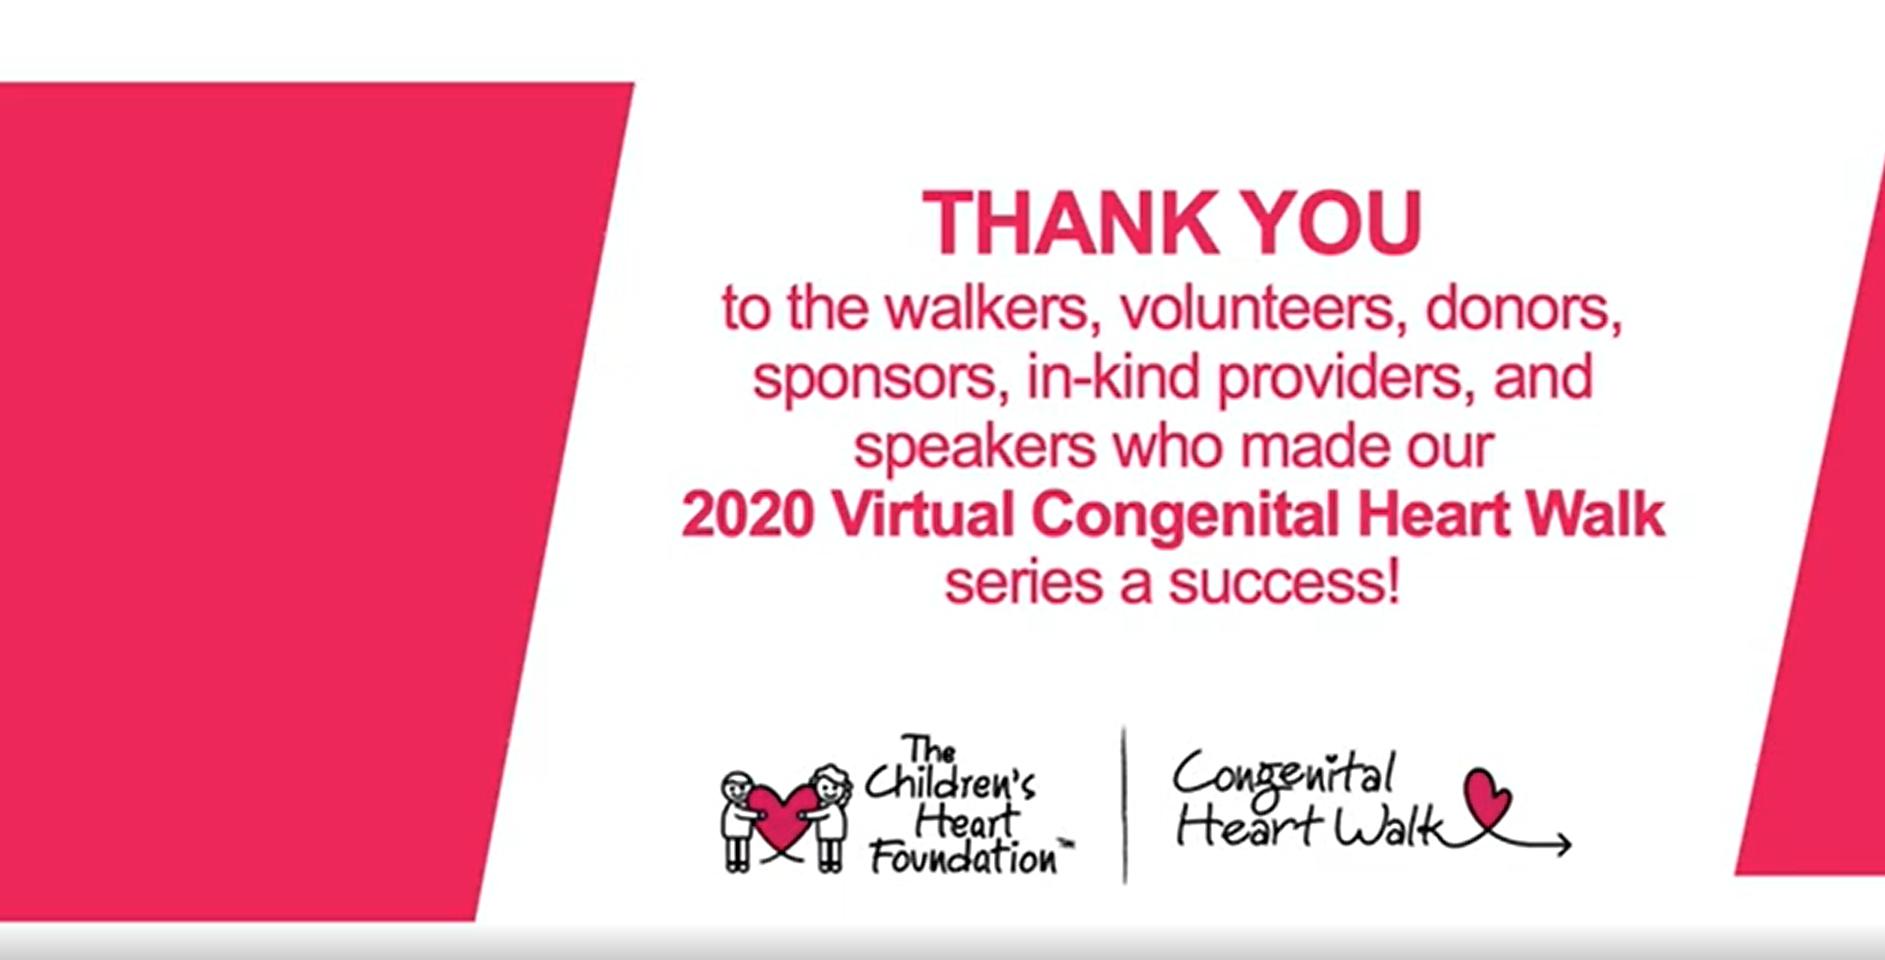 2020 Congenital Heart Walk Thank You Video